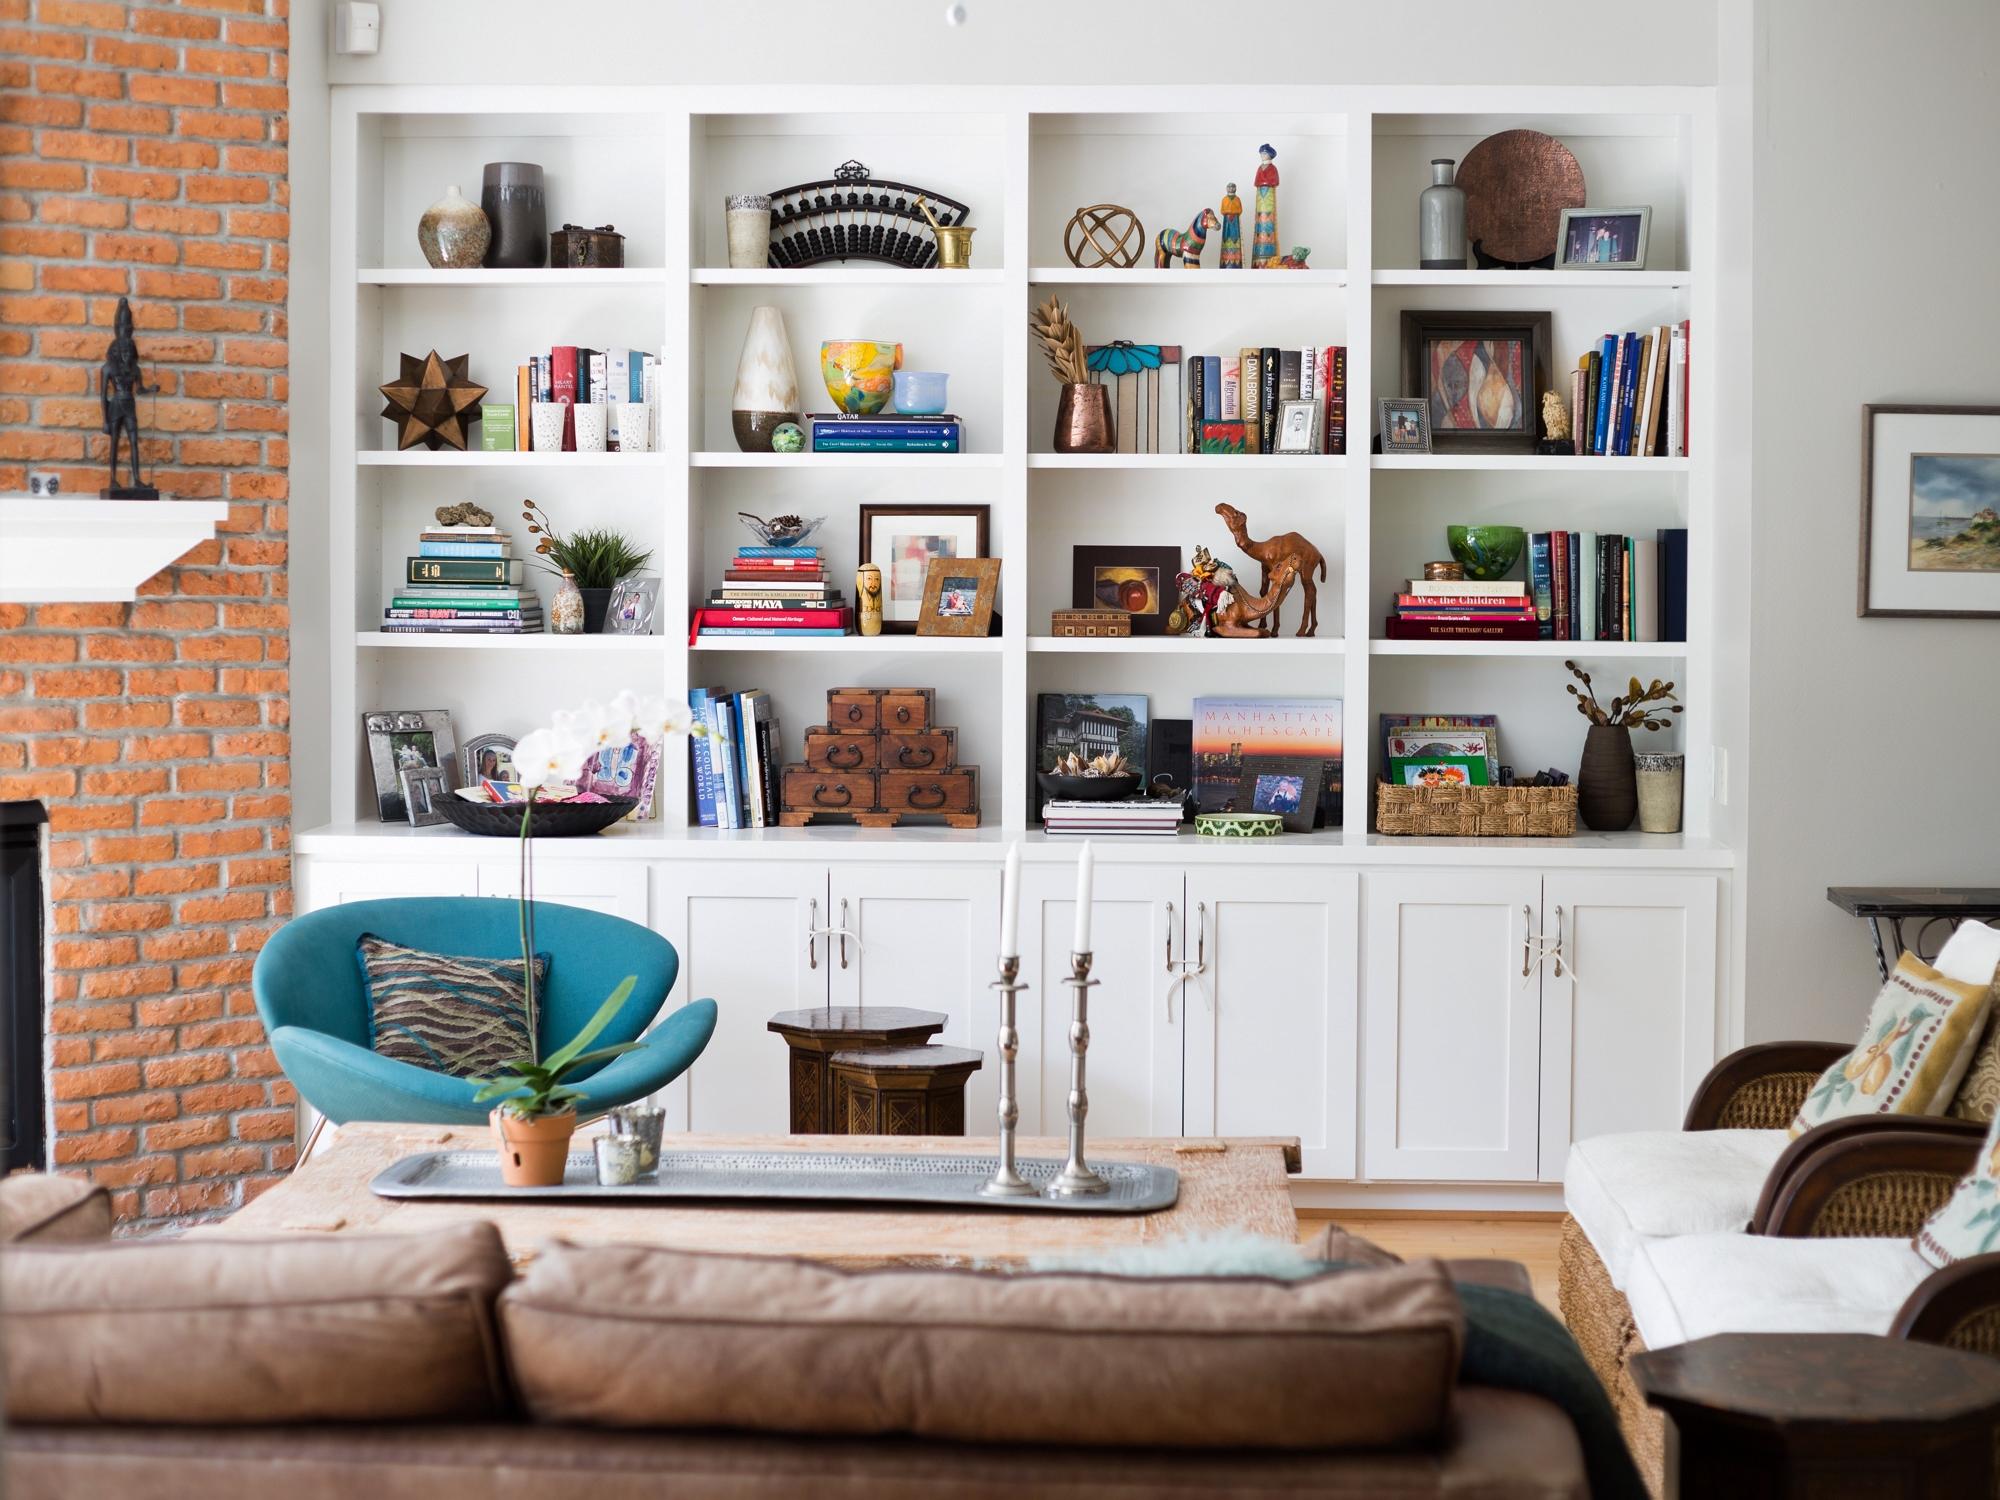 After - Bookshelf styling - Carla Aston, Designer / Tori Aston, Photographer